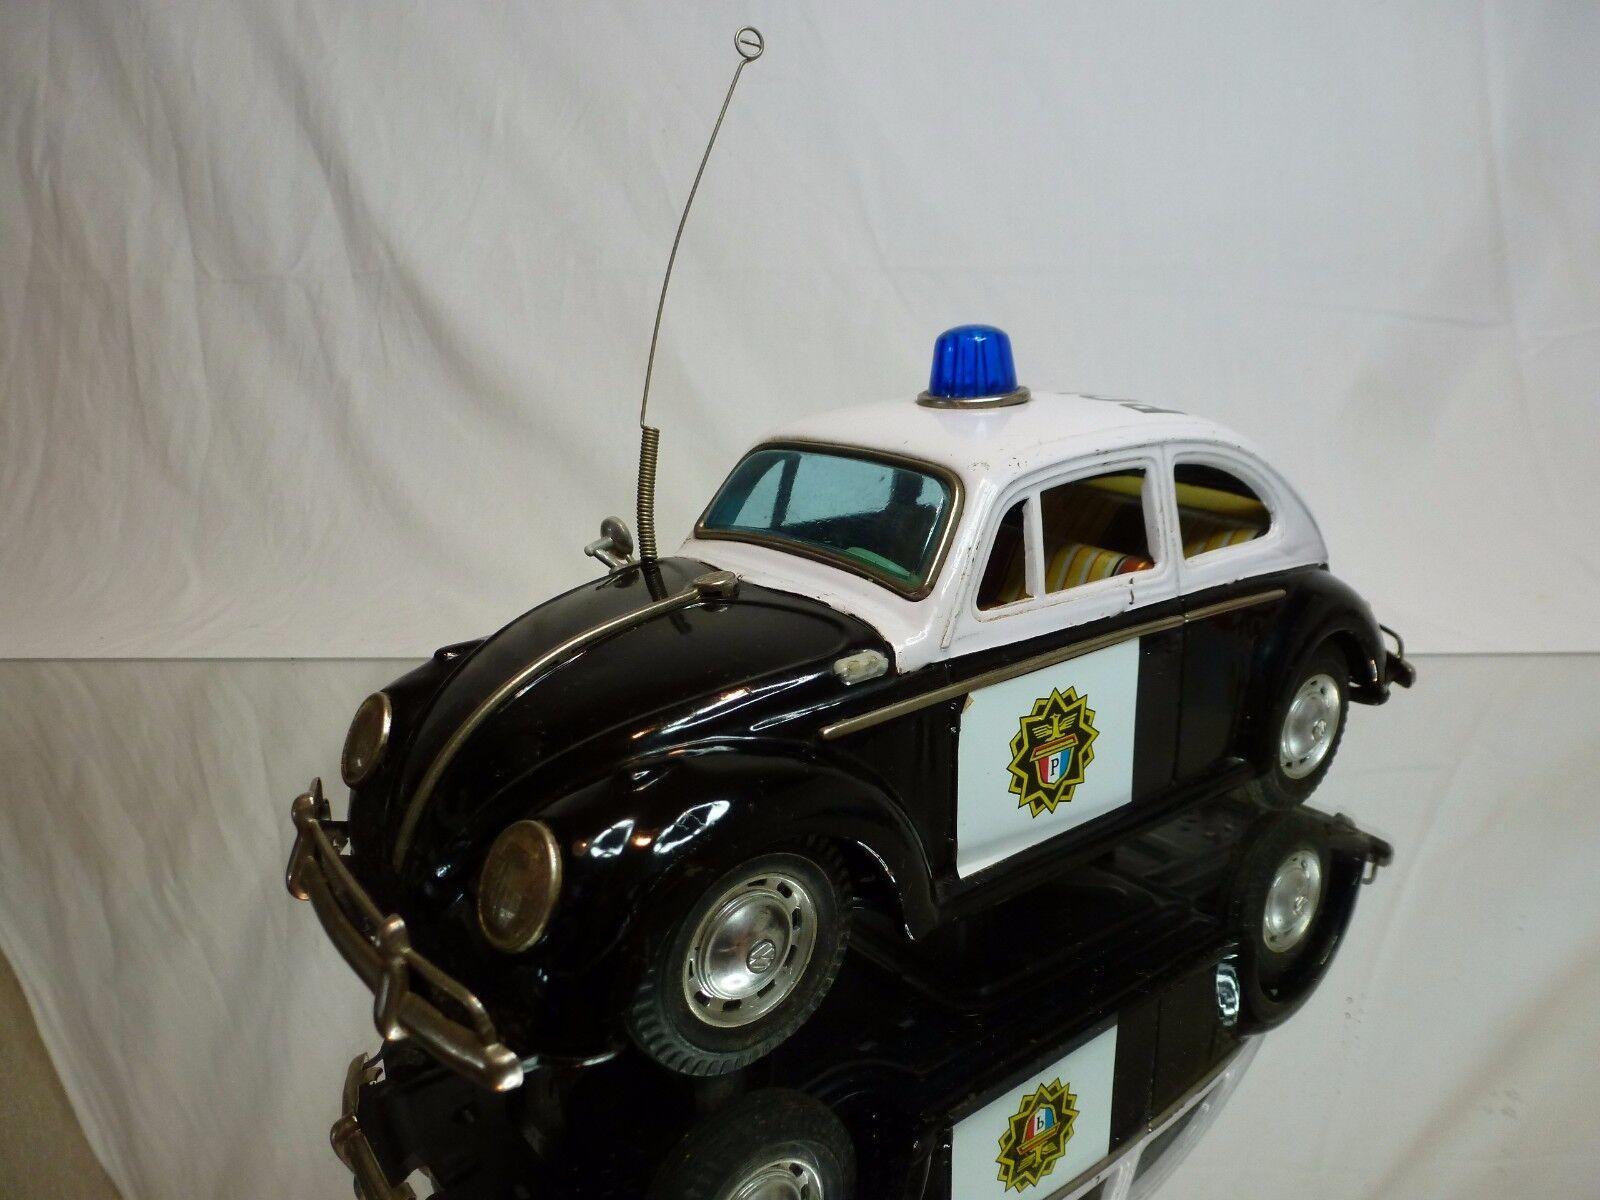 TIN TOYS MT MODERN TOYS JAPAN  VW VOLKSWAGEN BEETLE - POLICE  RARE - BATTERY